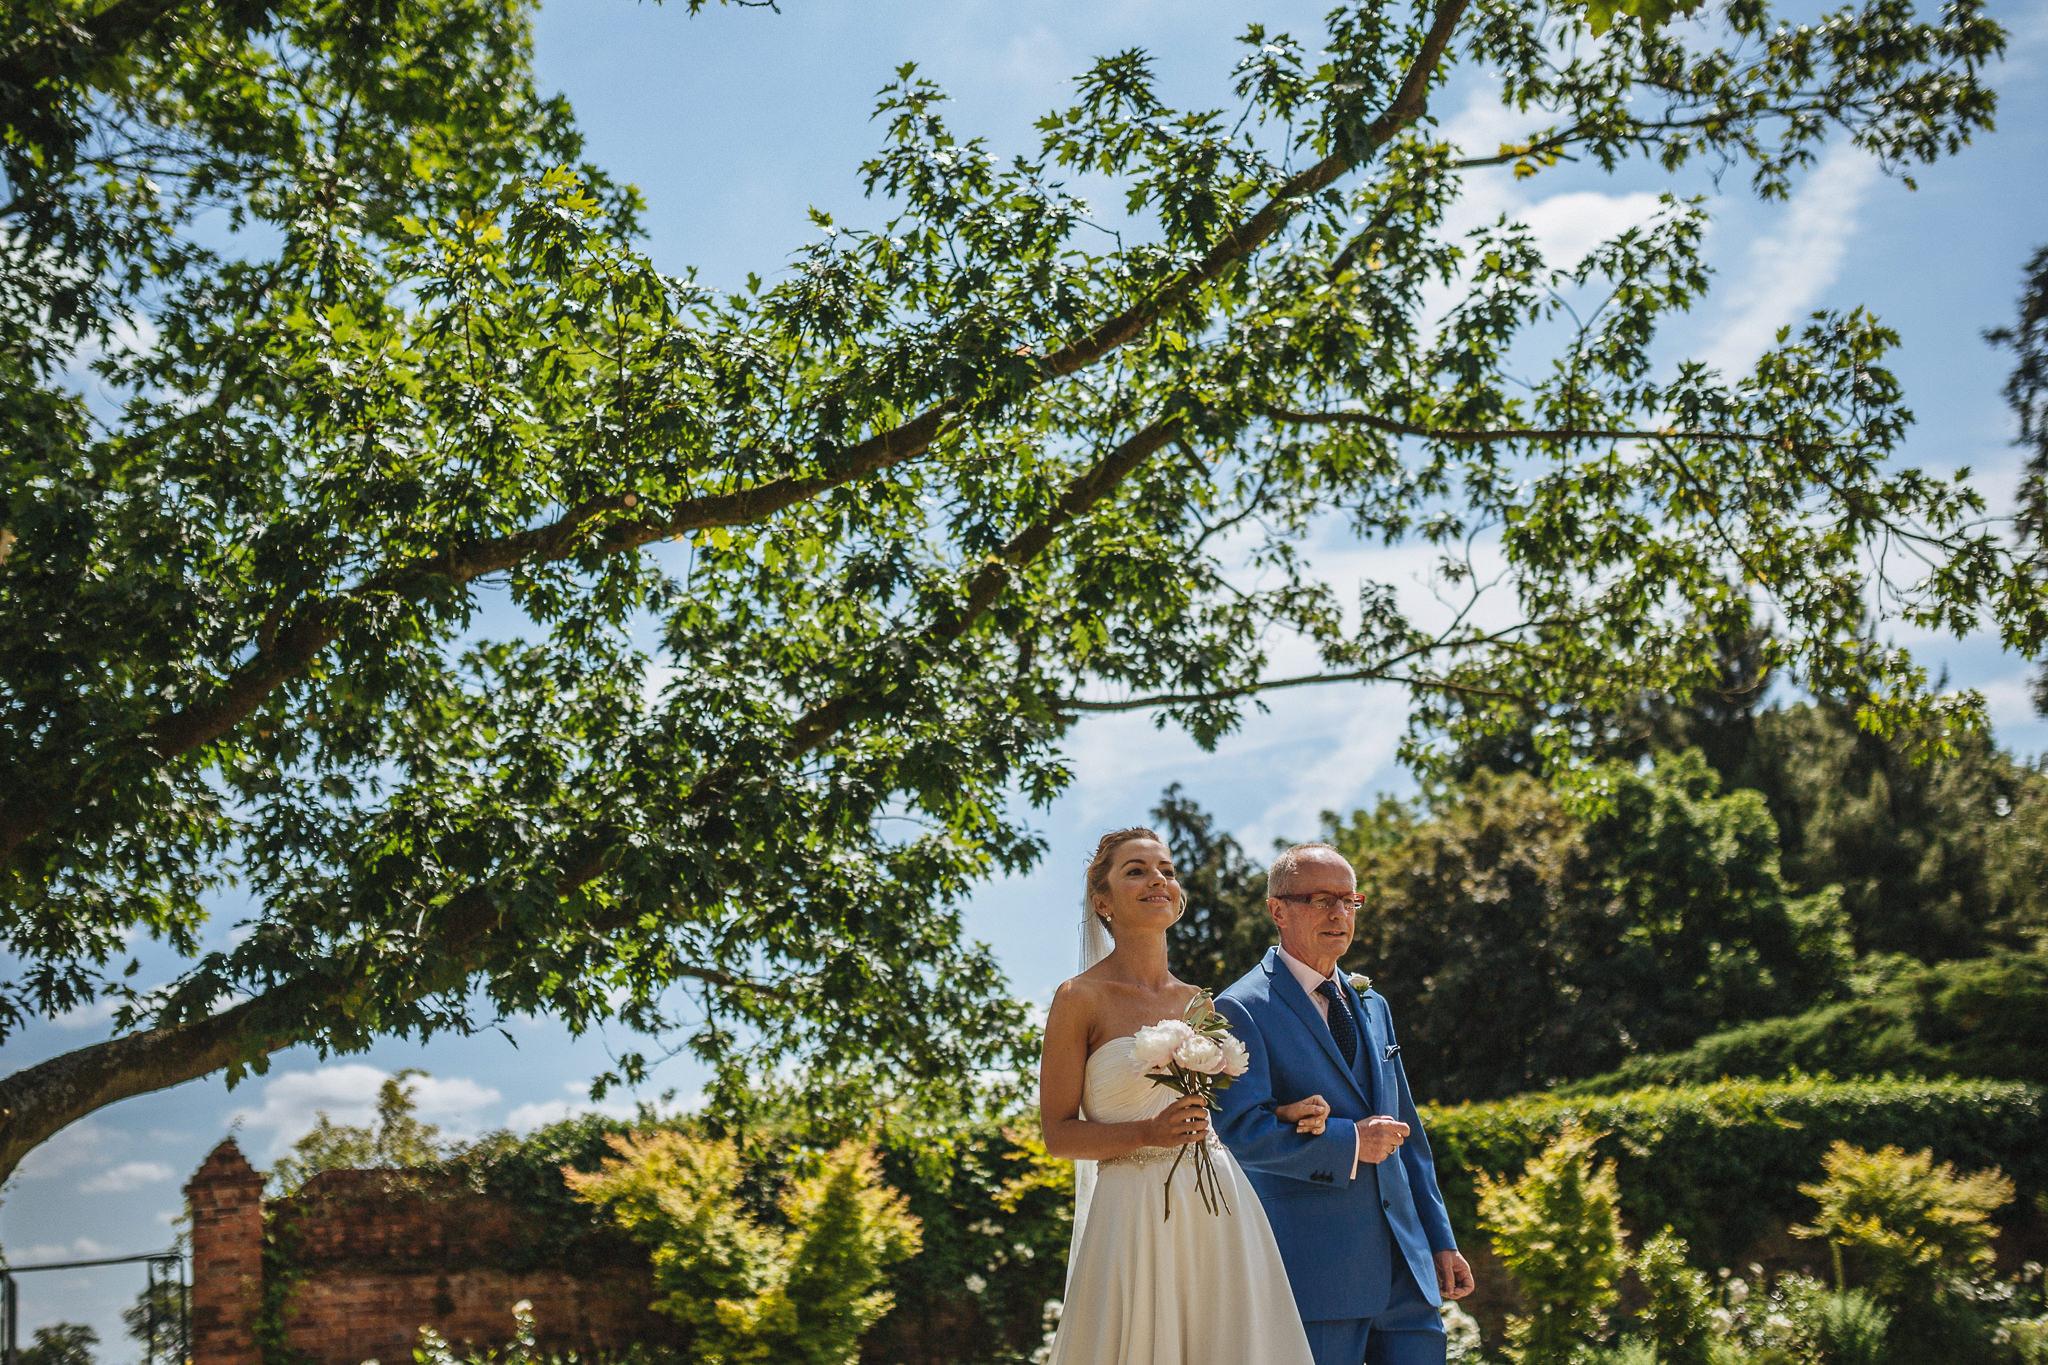 paul-marbrook-Gaynes-Park Wedding-Photographer-90042